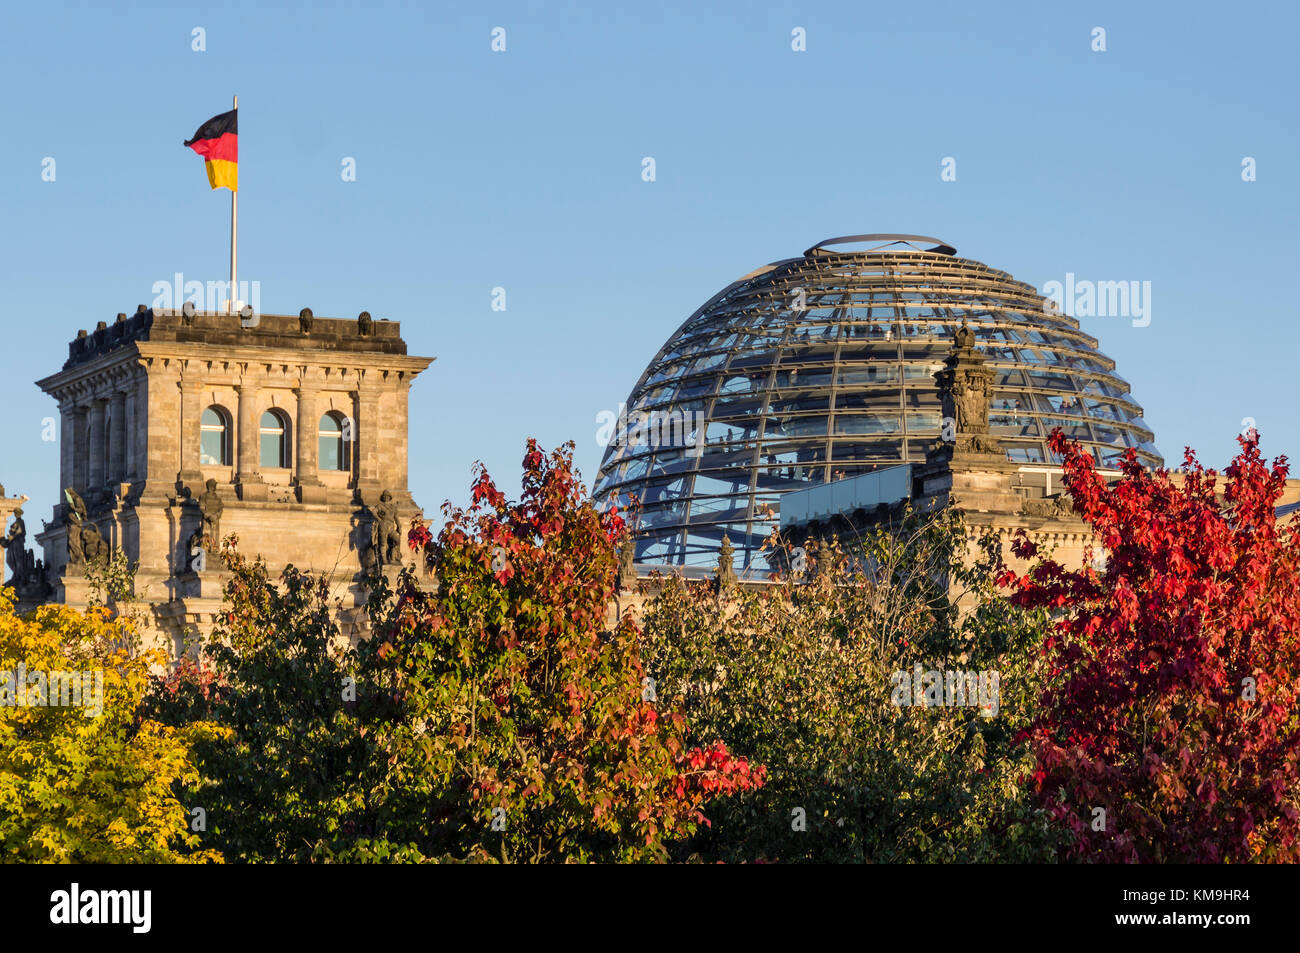 Reichtagsgebaeude, Kuppel, Herbst, Berlin - Stock Image